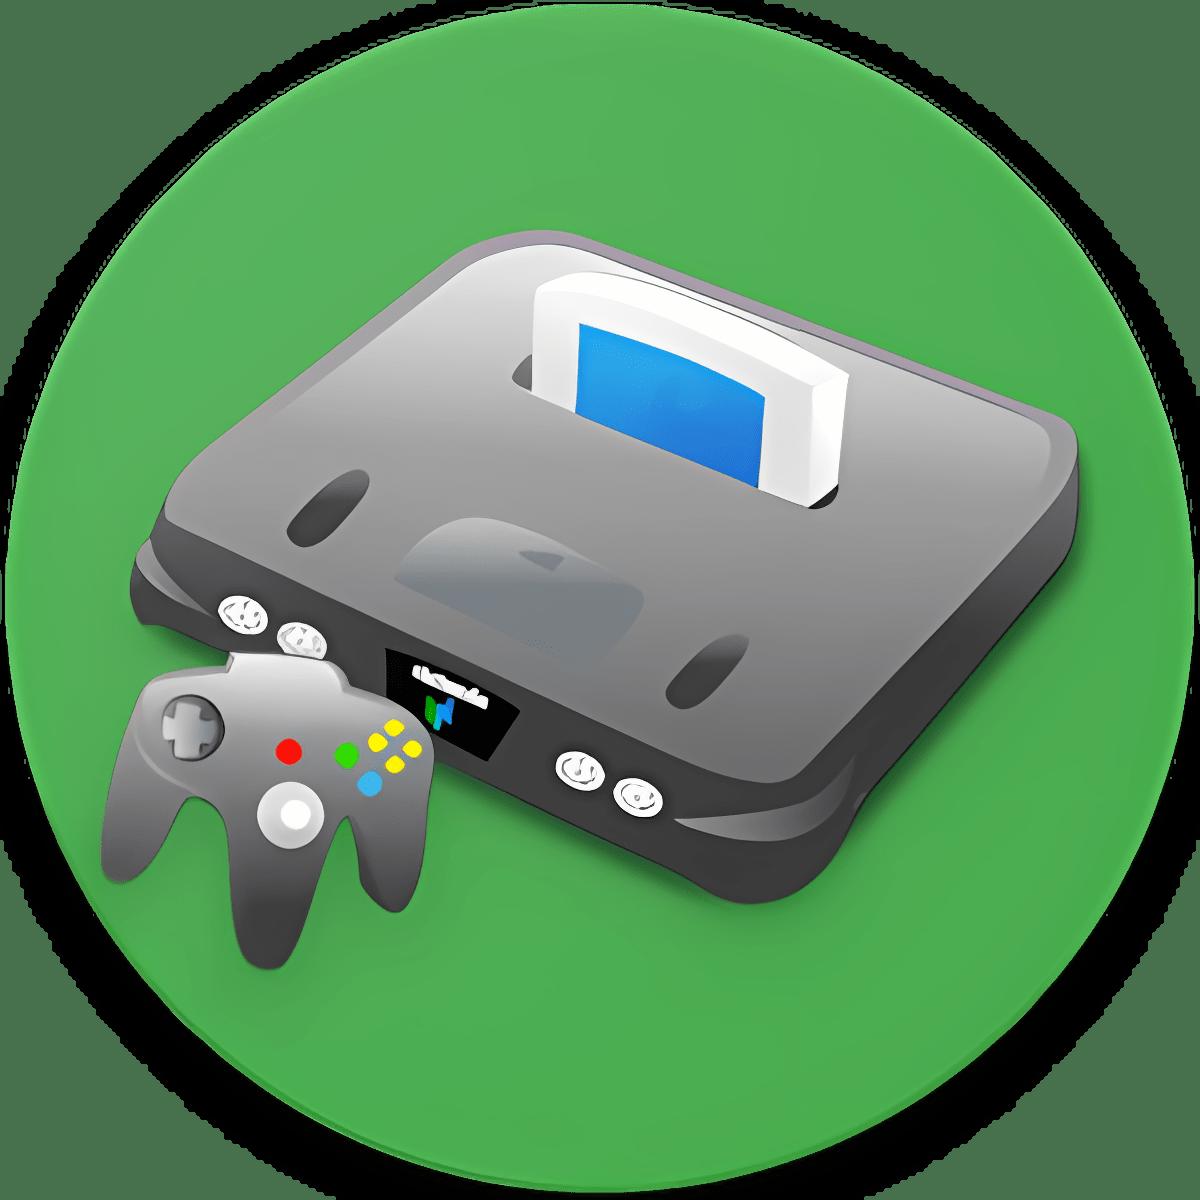 Cool N64 Emulator for All Game